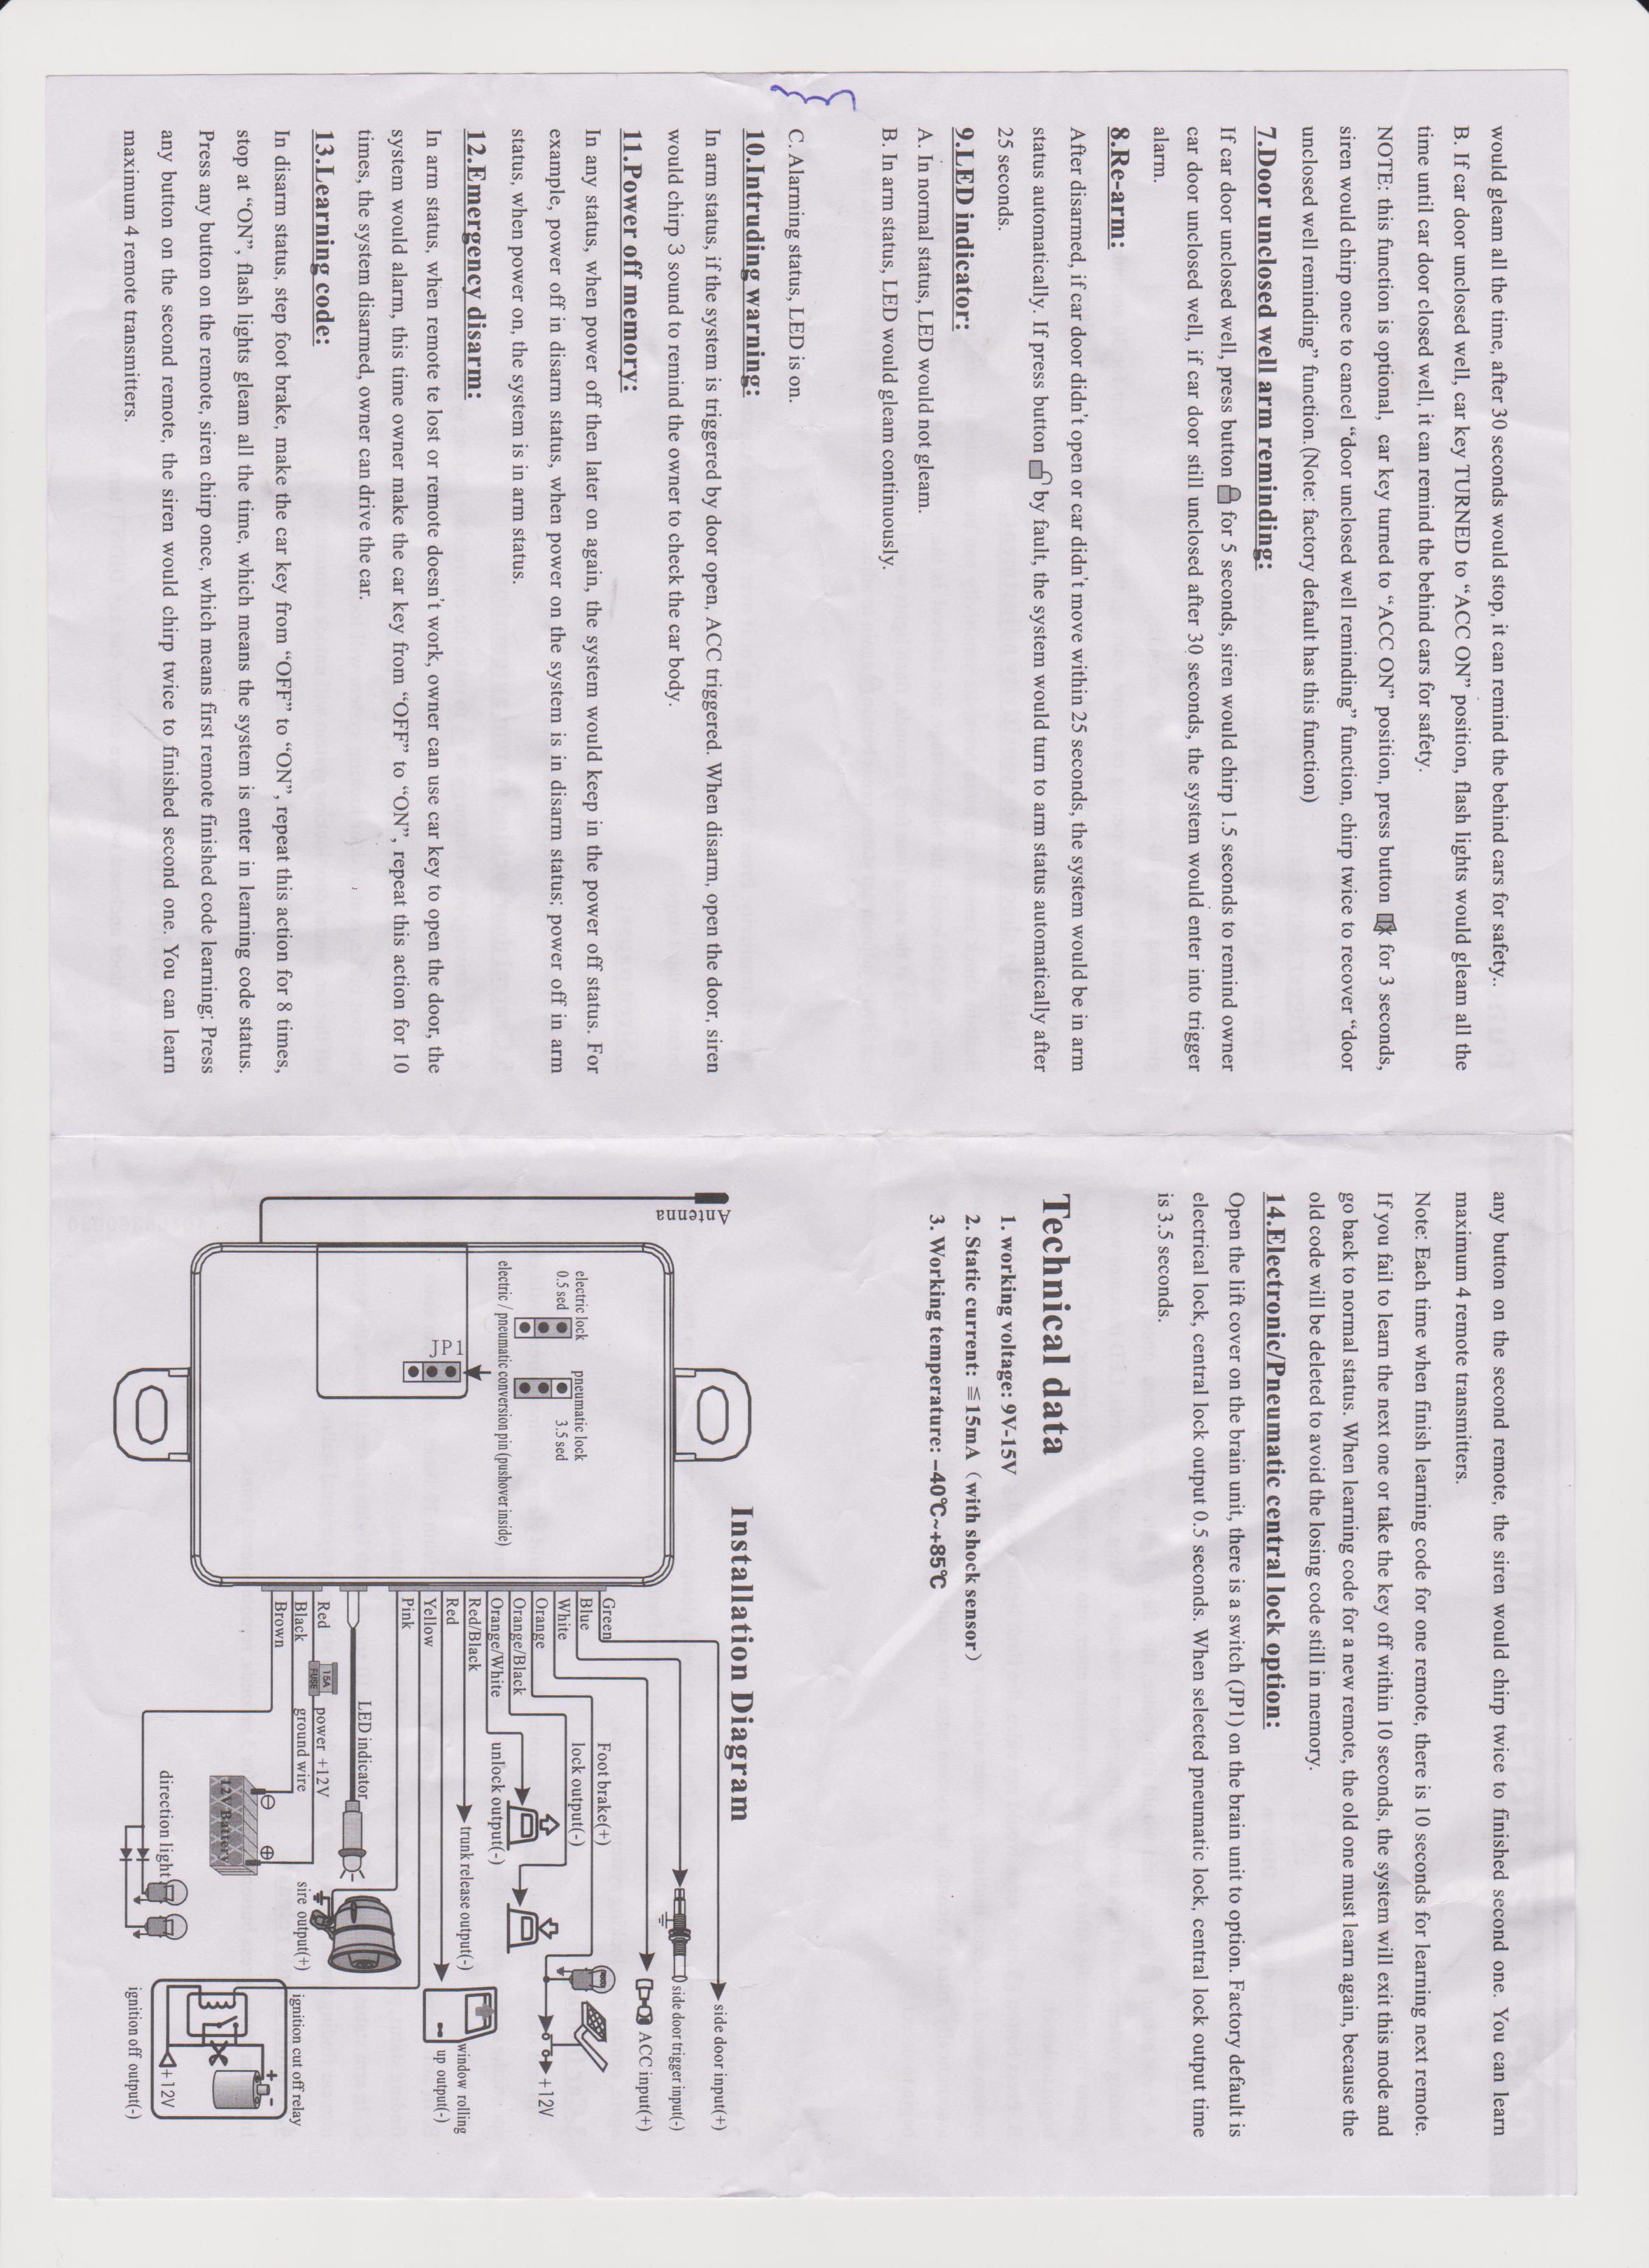 Trombetta Solenoid 12v Wiring Diagram